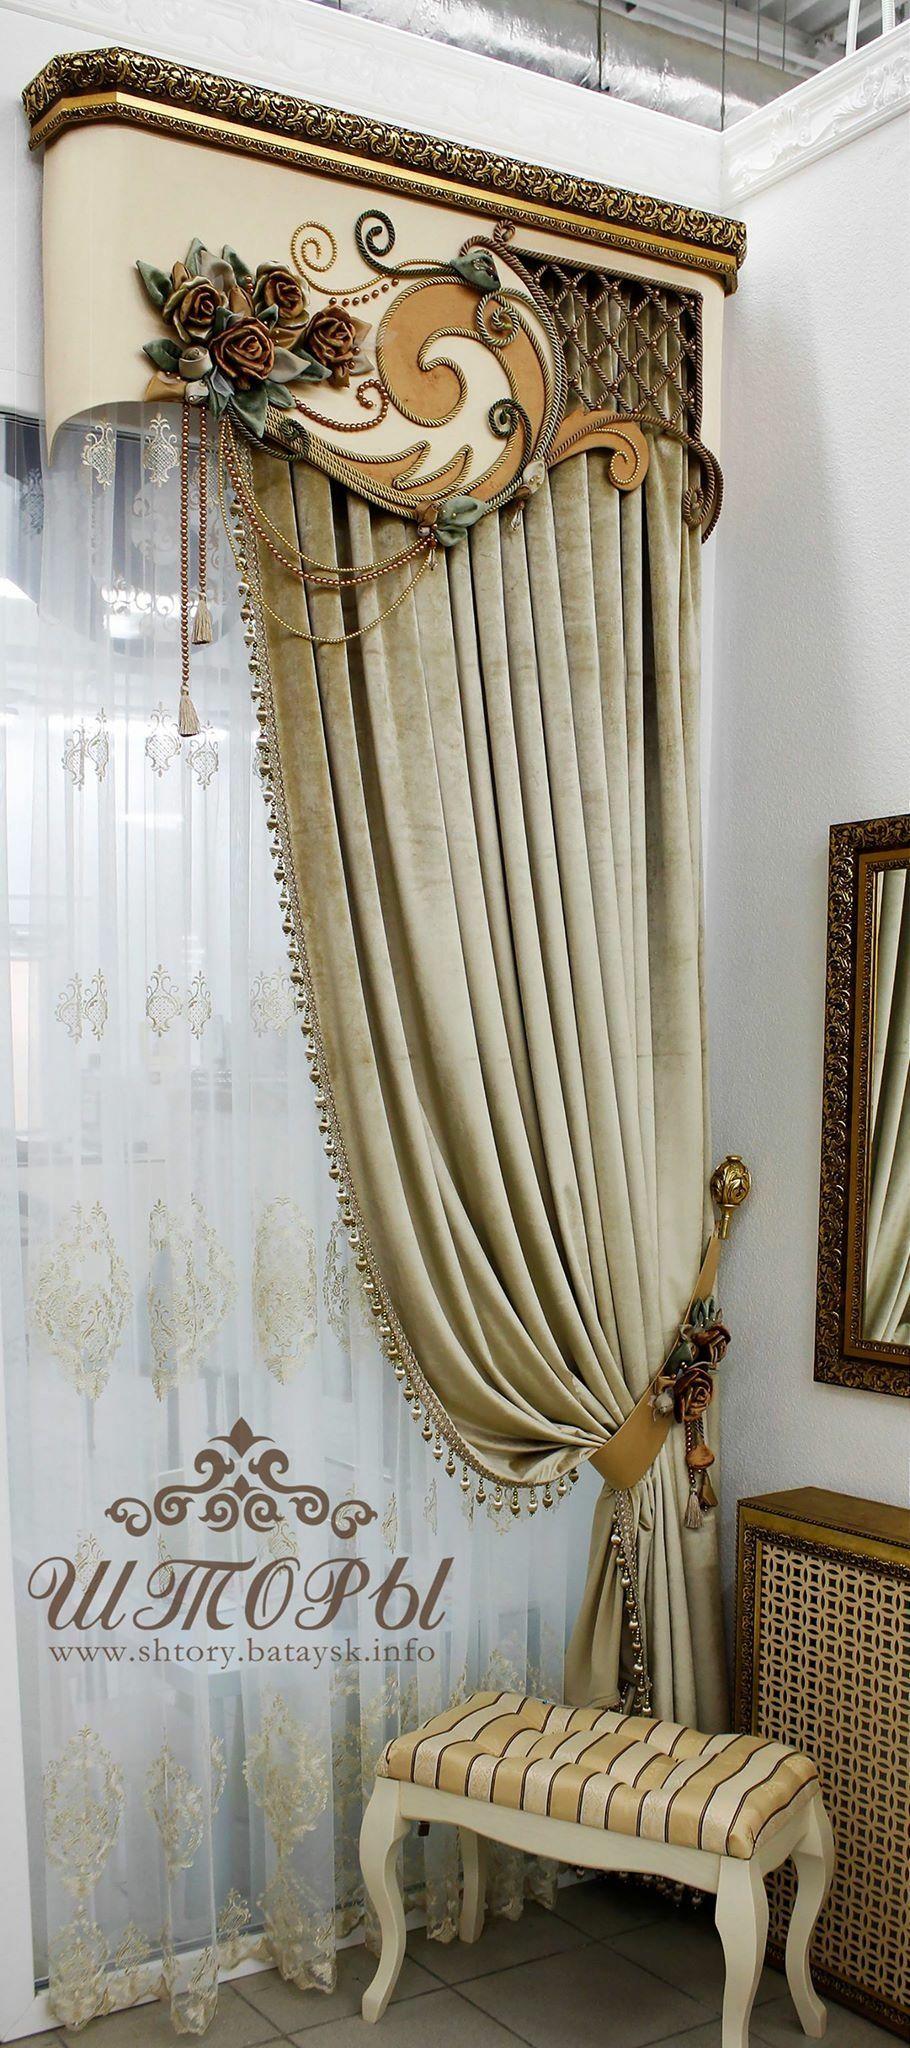 Incredible cornice design Draperies are also gorgeous ...